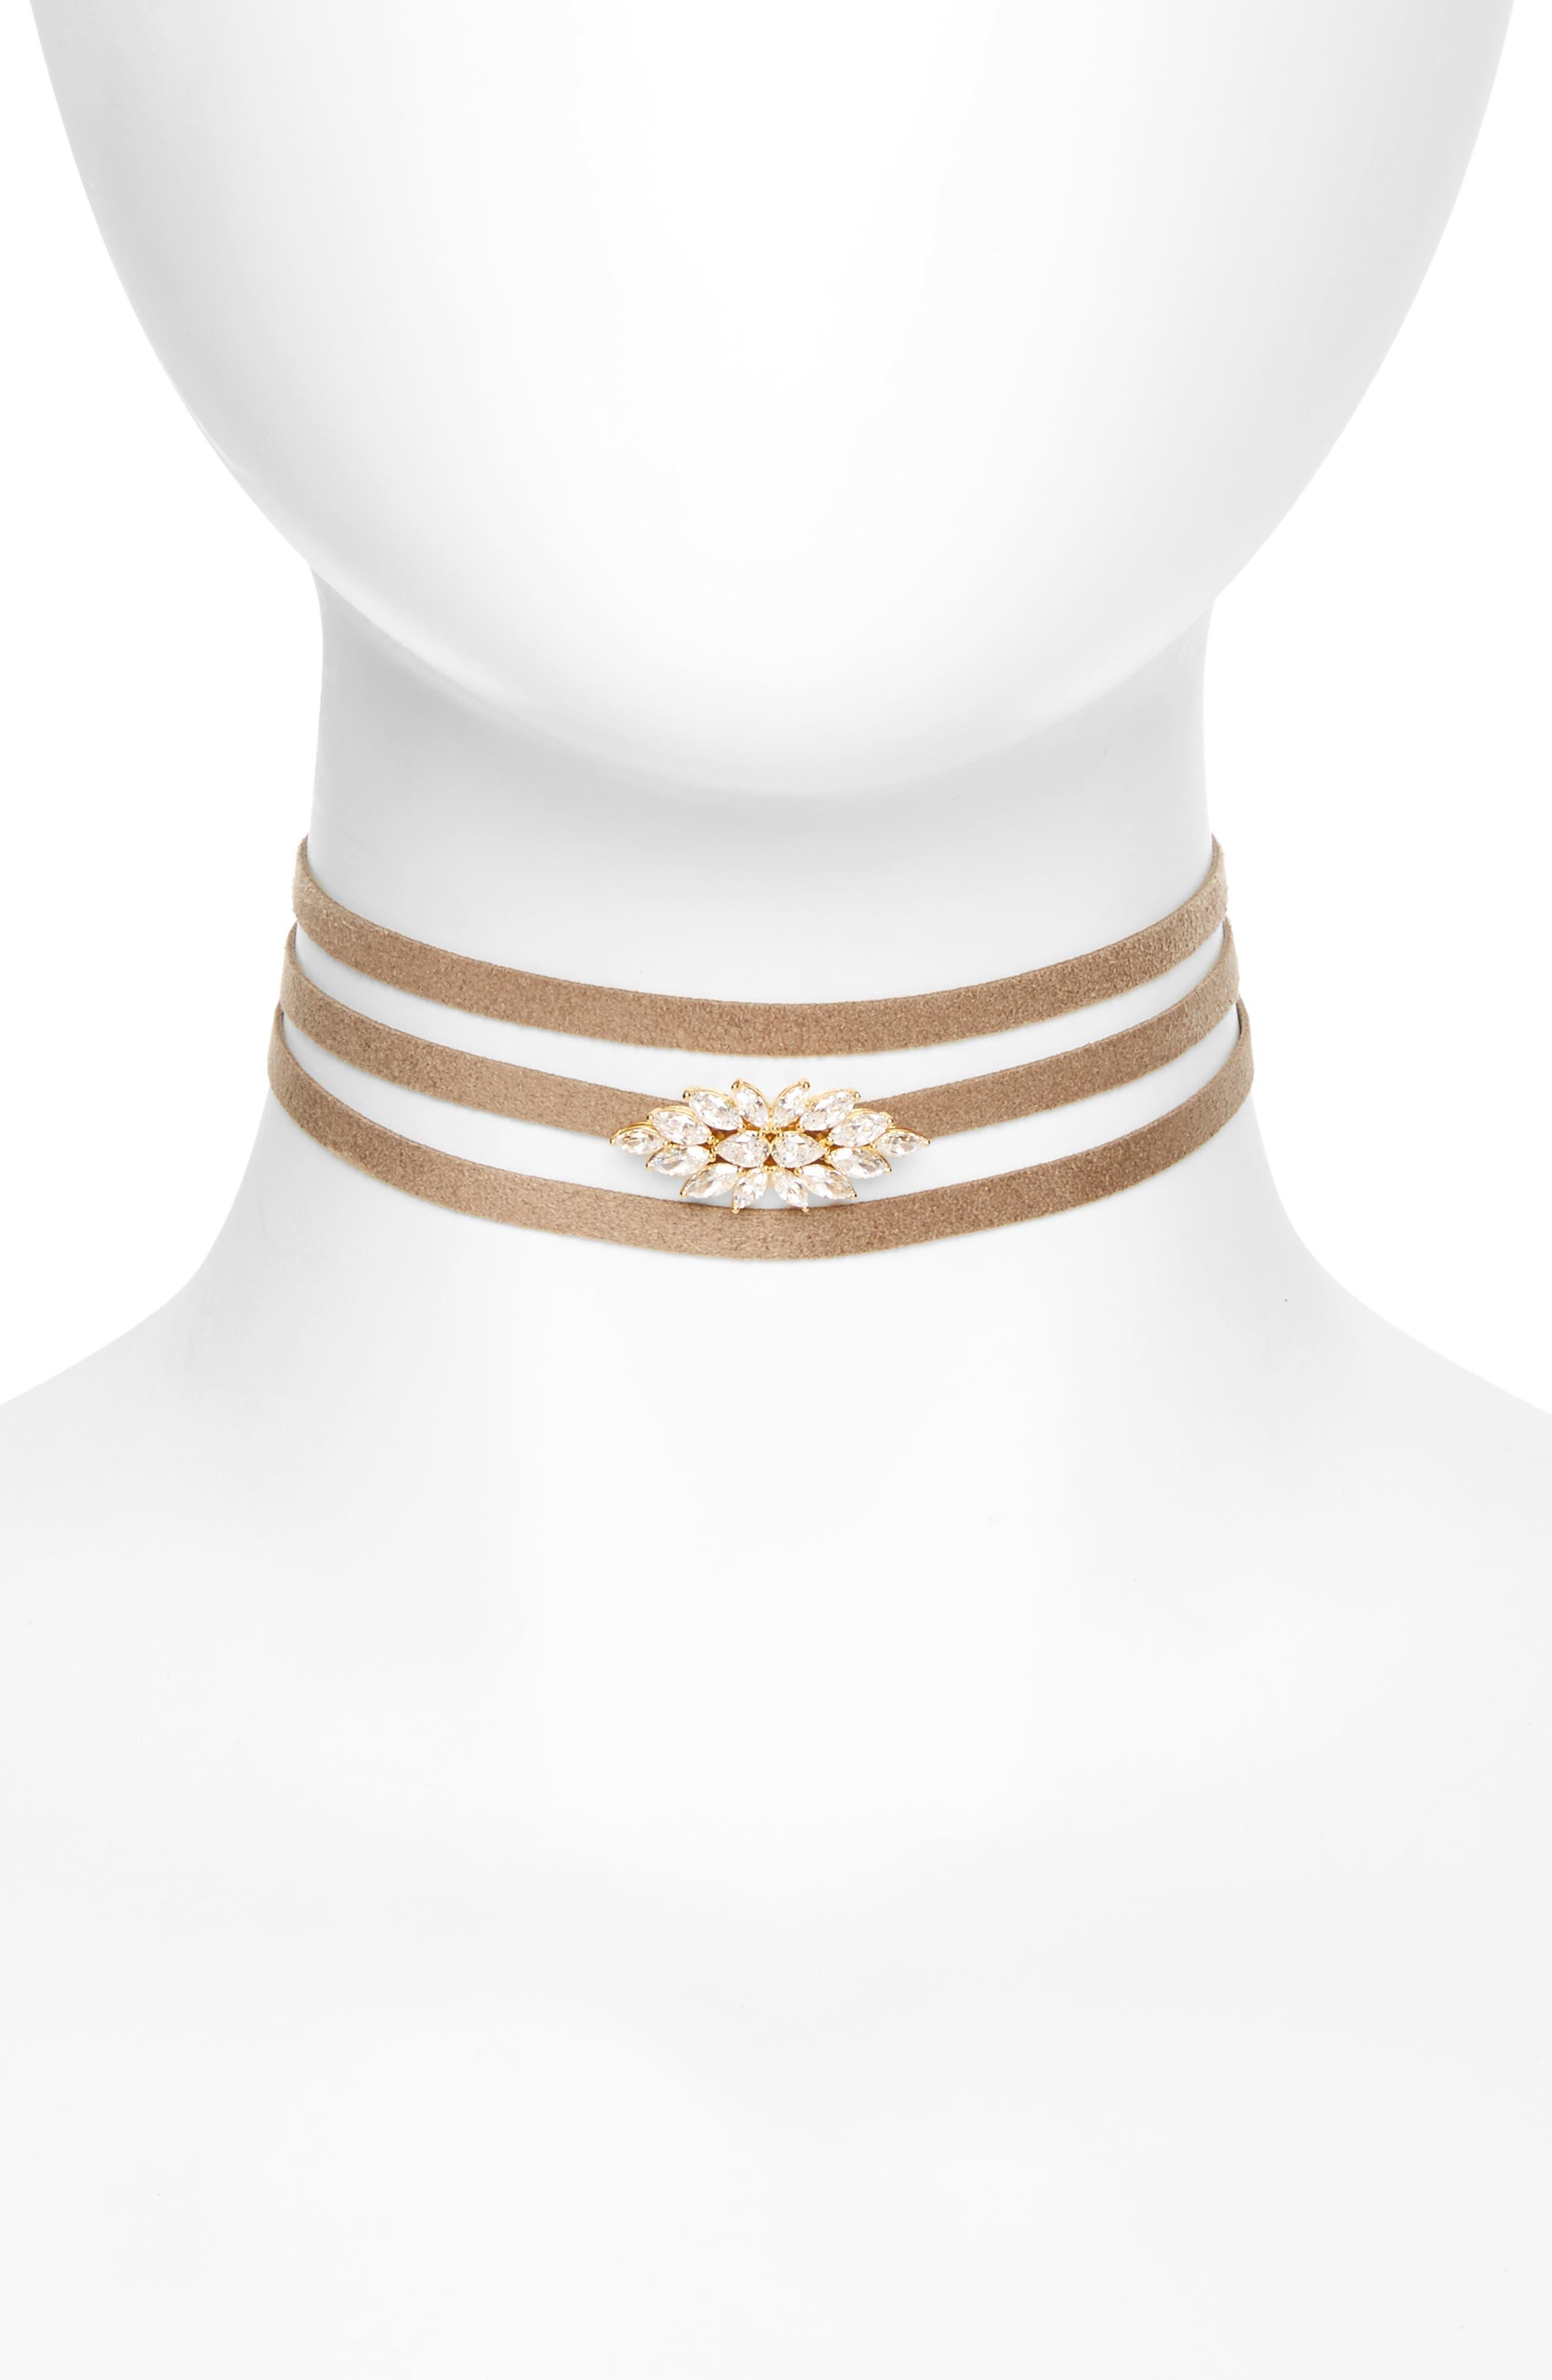 Alternate Image 1 Selected - Nadri Wrap Choker Necklace